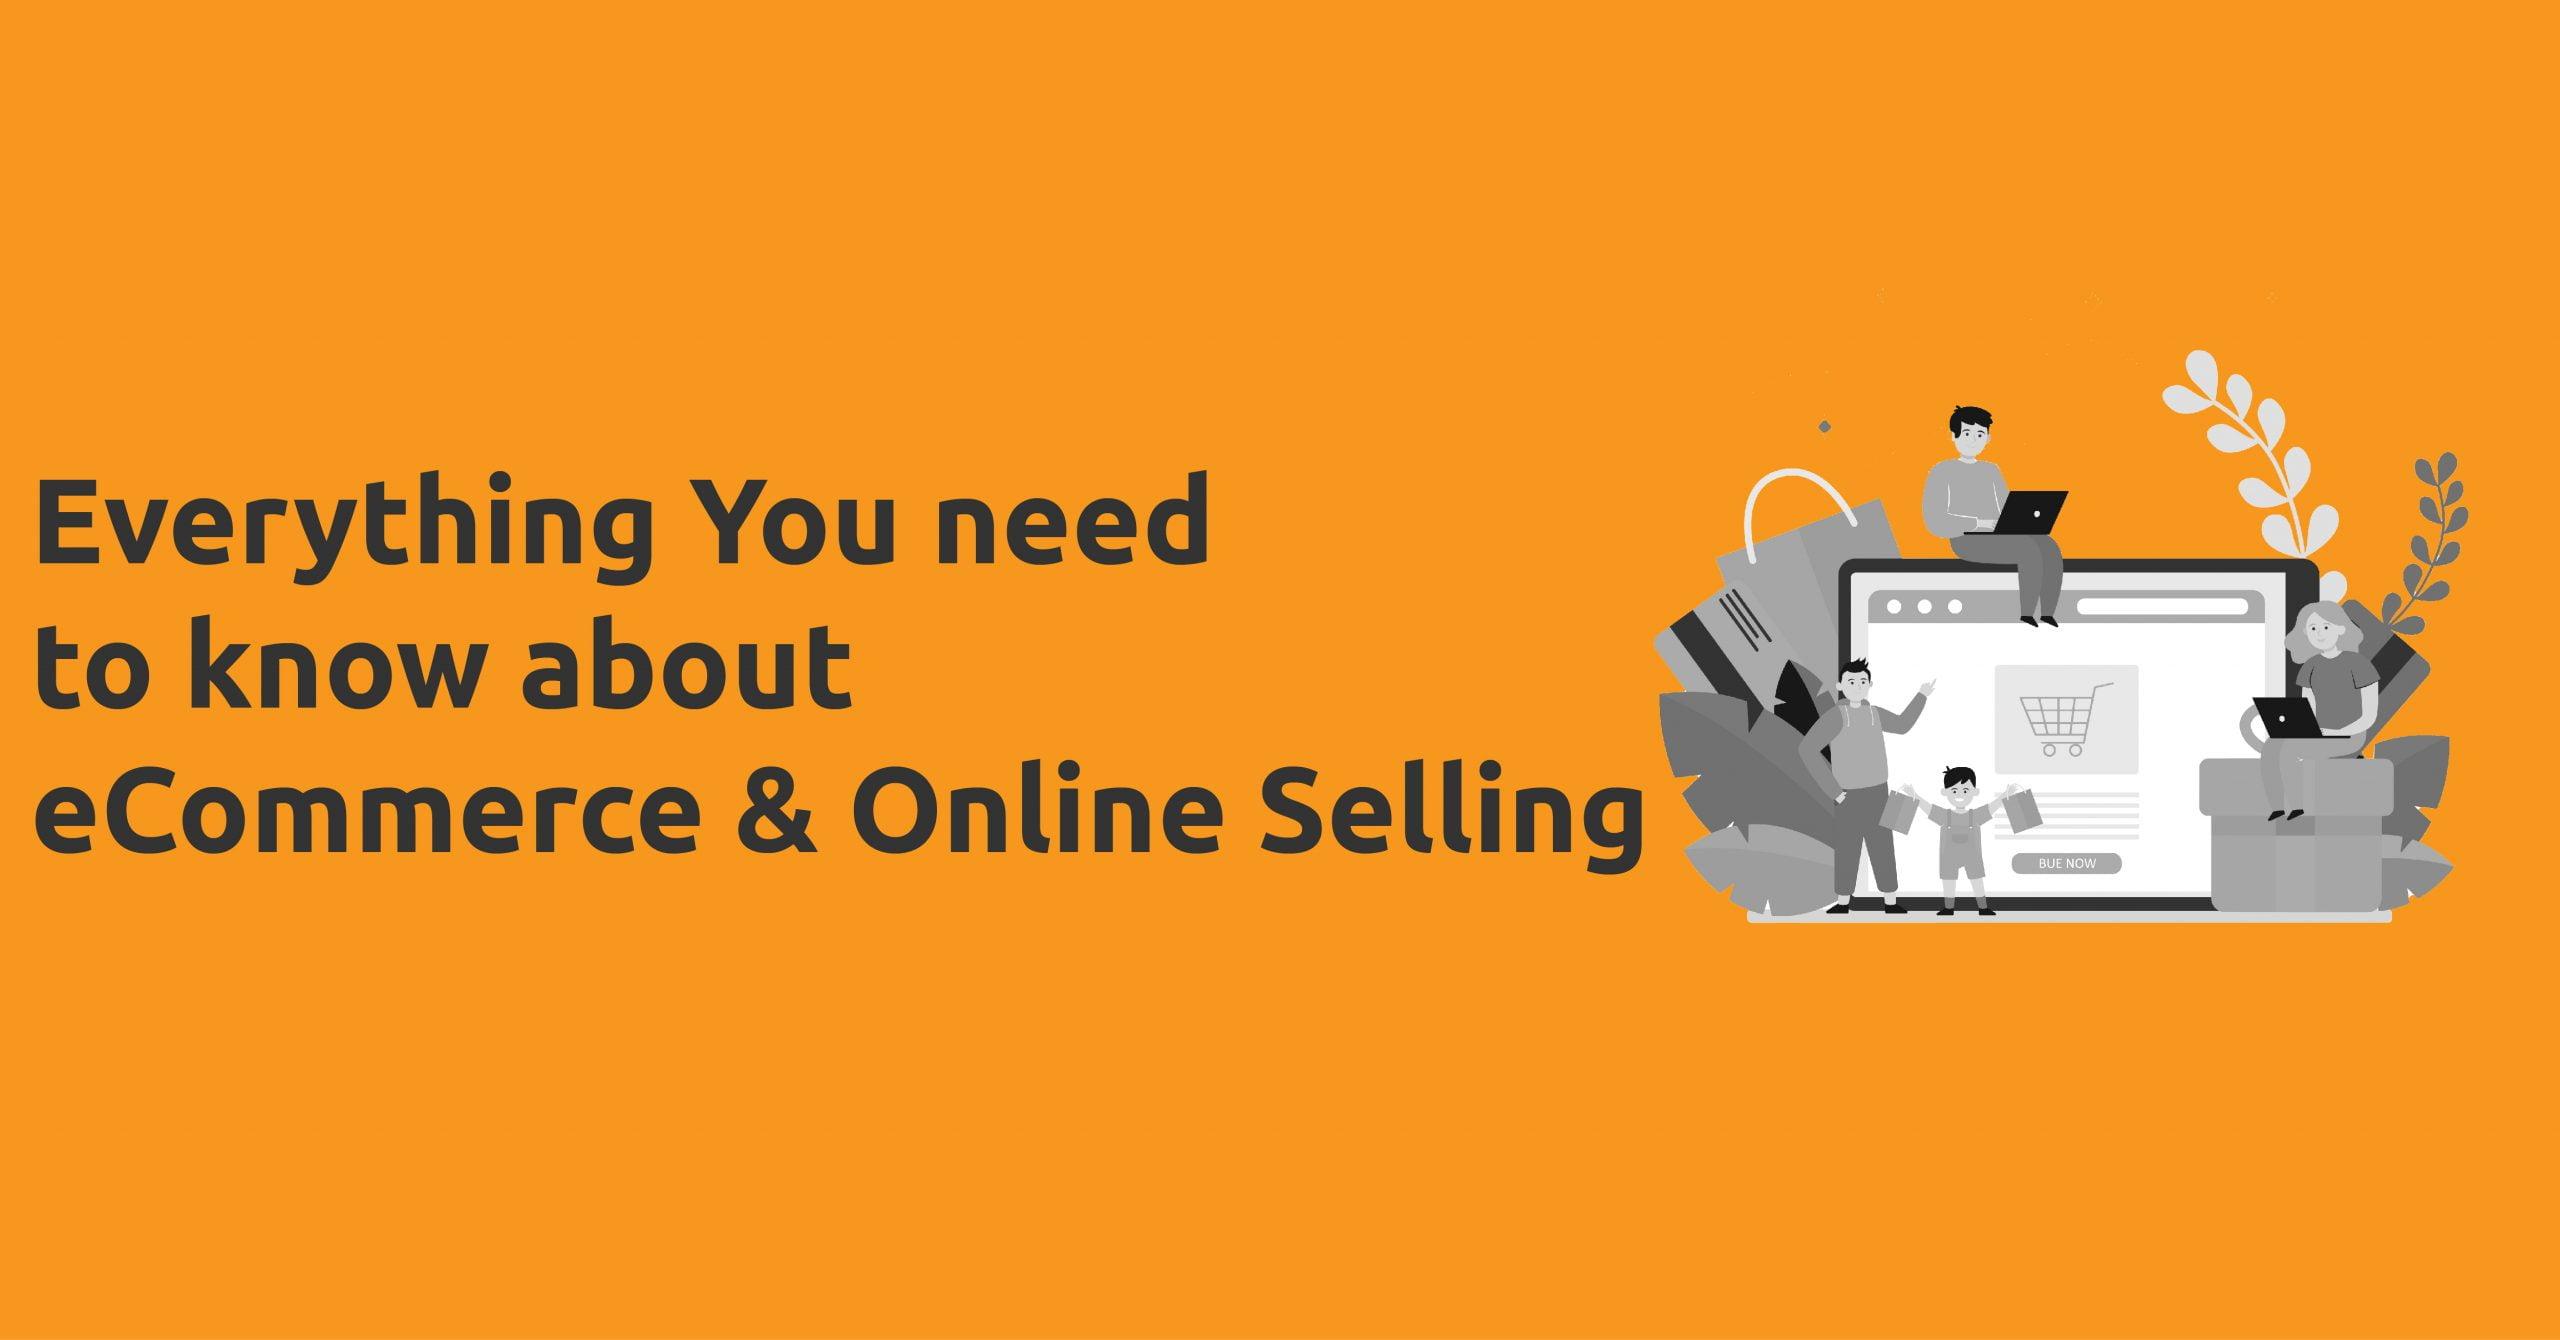 ecommerce-online-selling-sellersupport